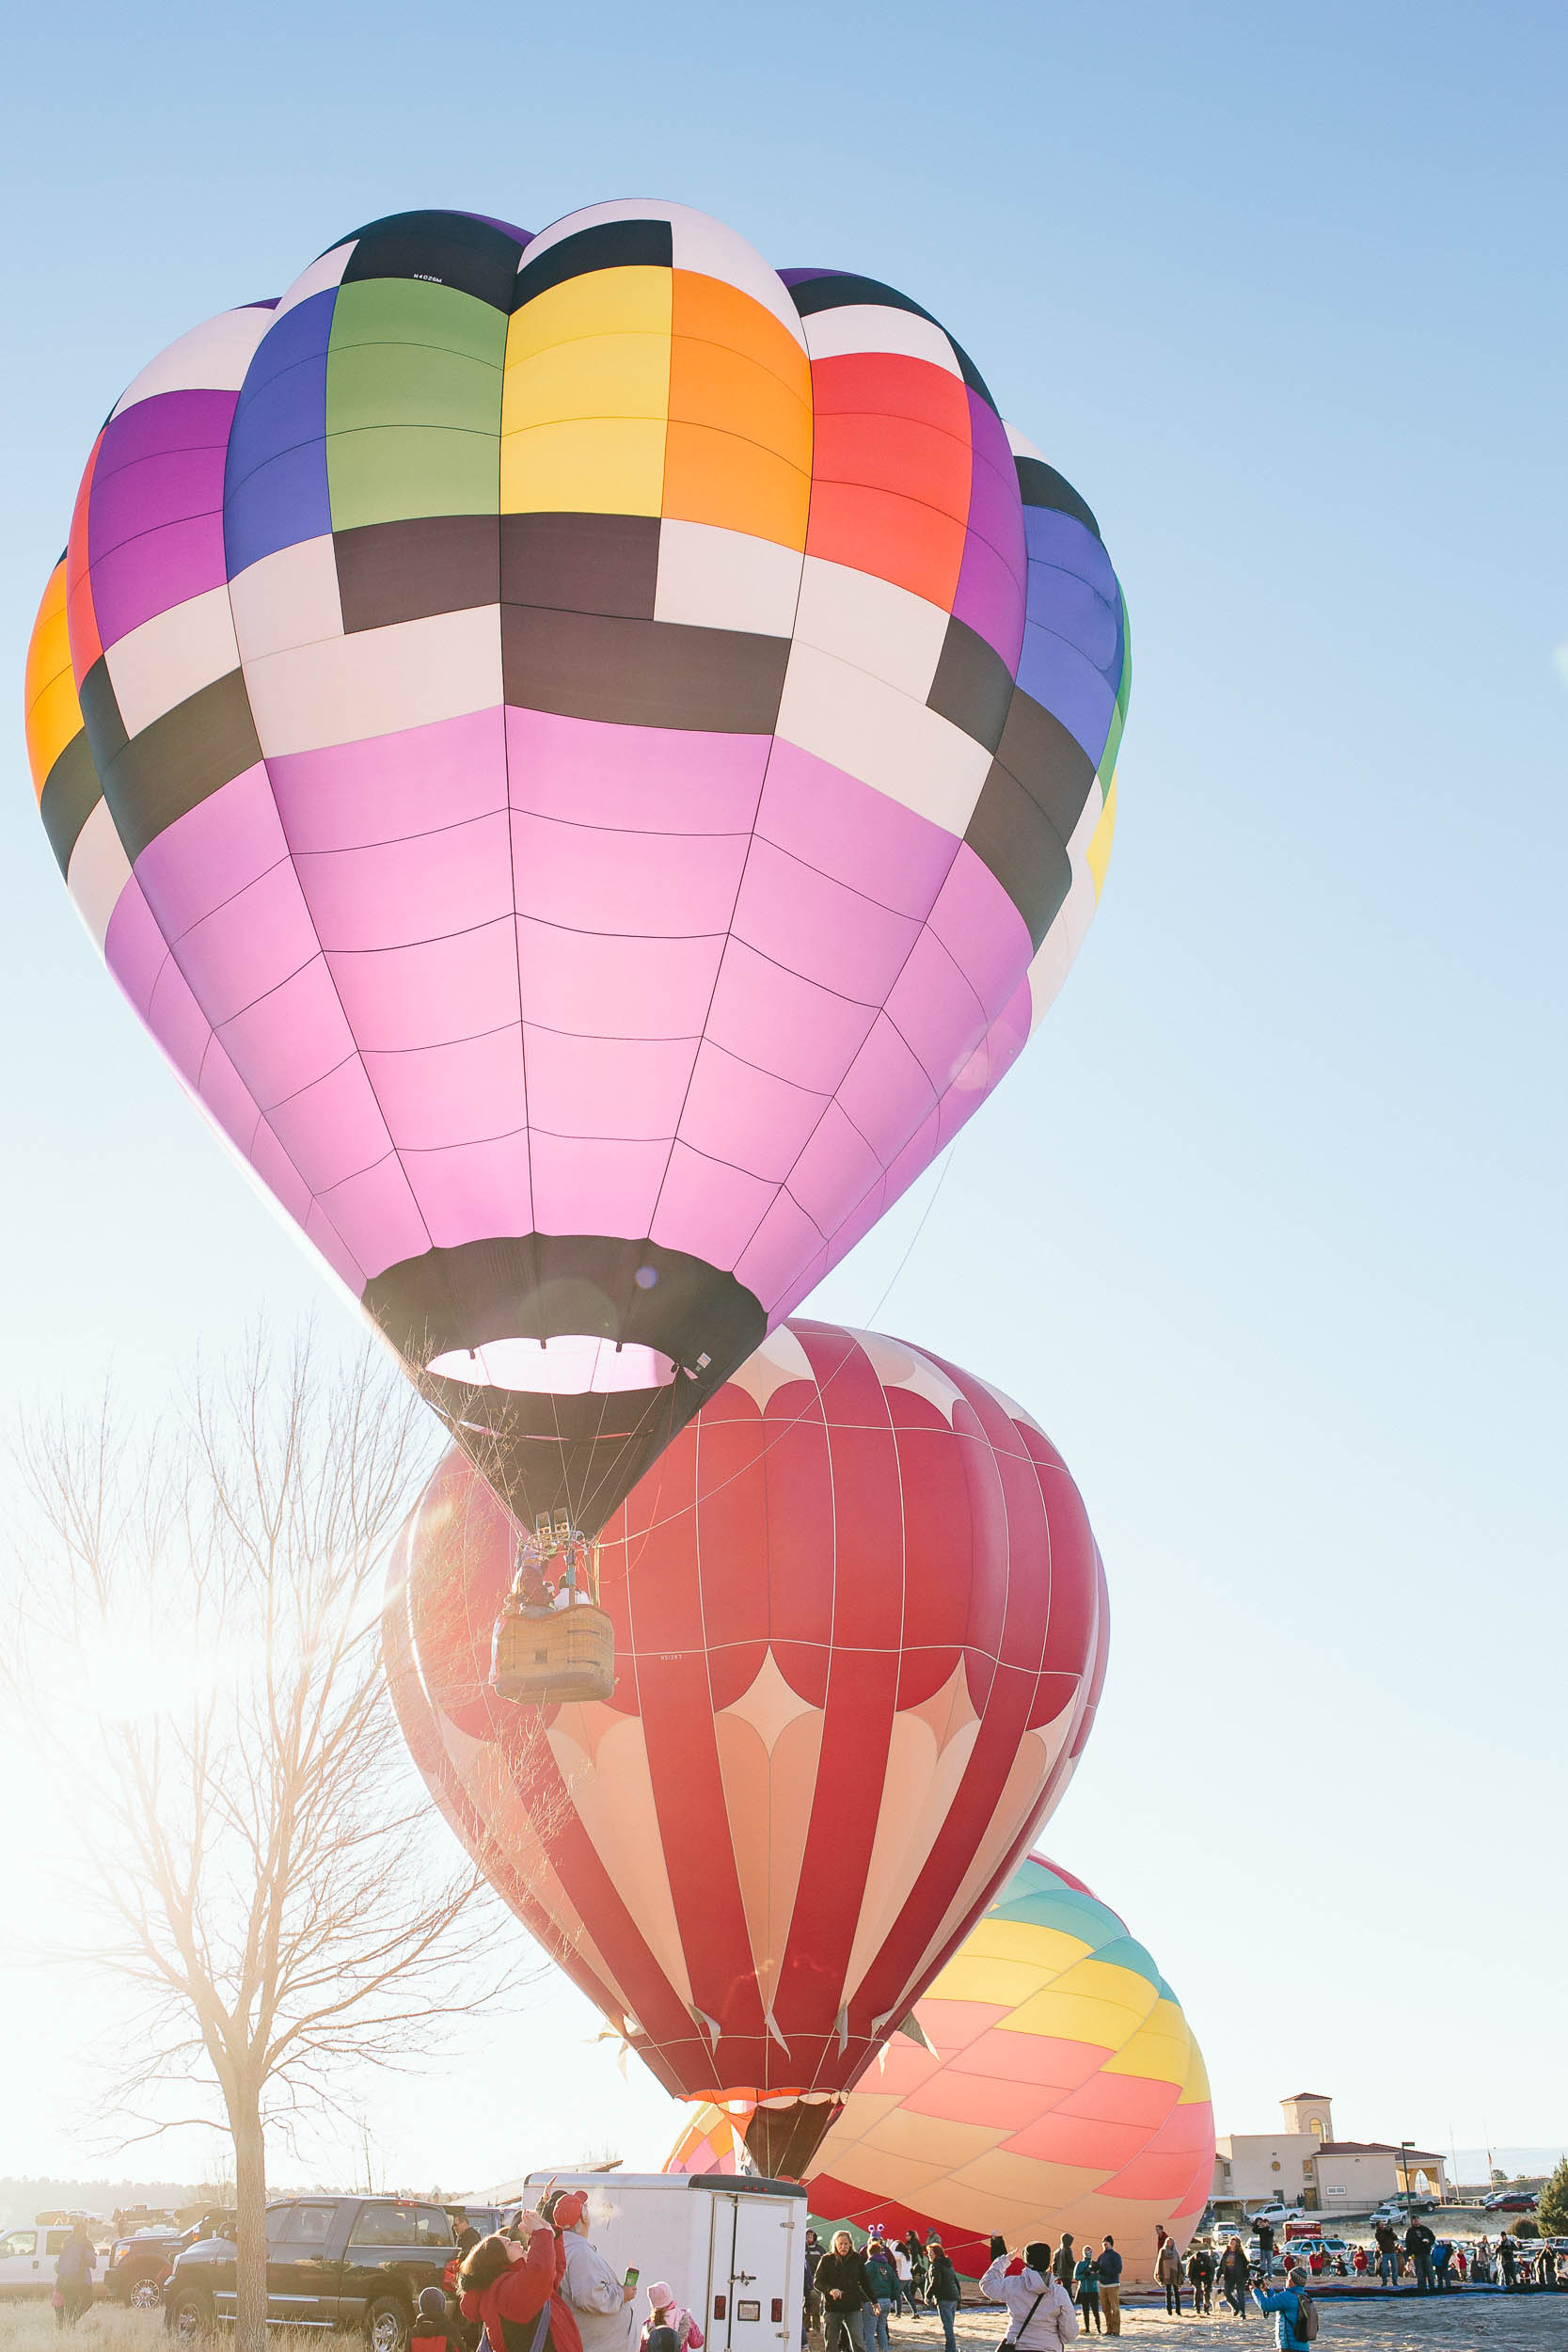 Kyle-Sheppard-Kanab-Balloon-Festival-13.jpg